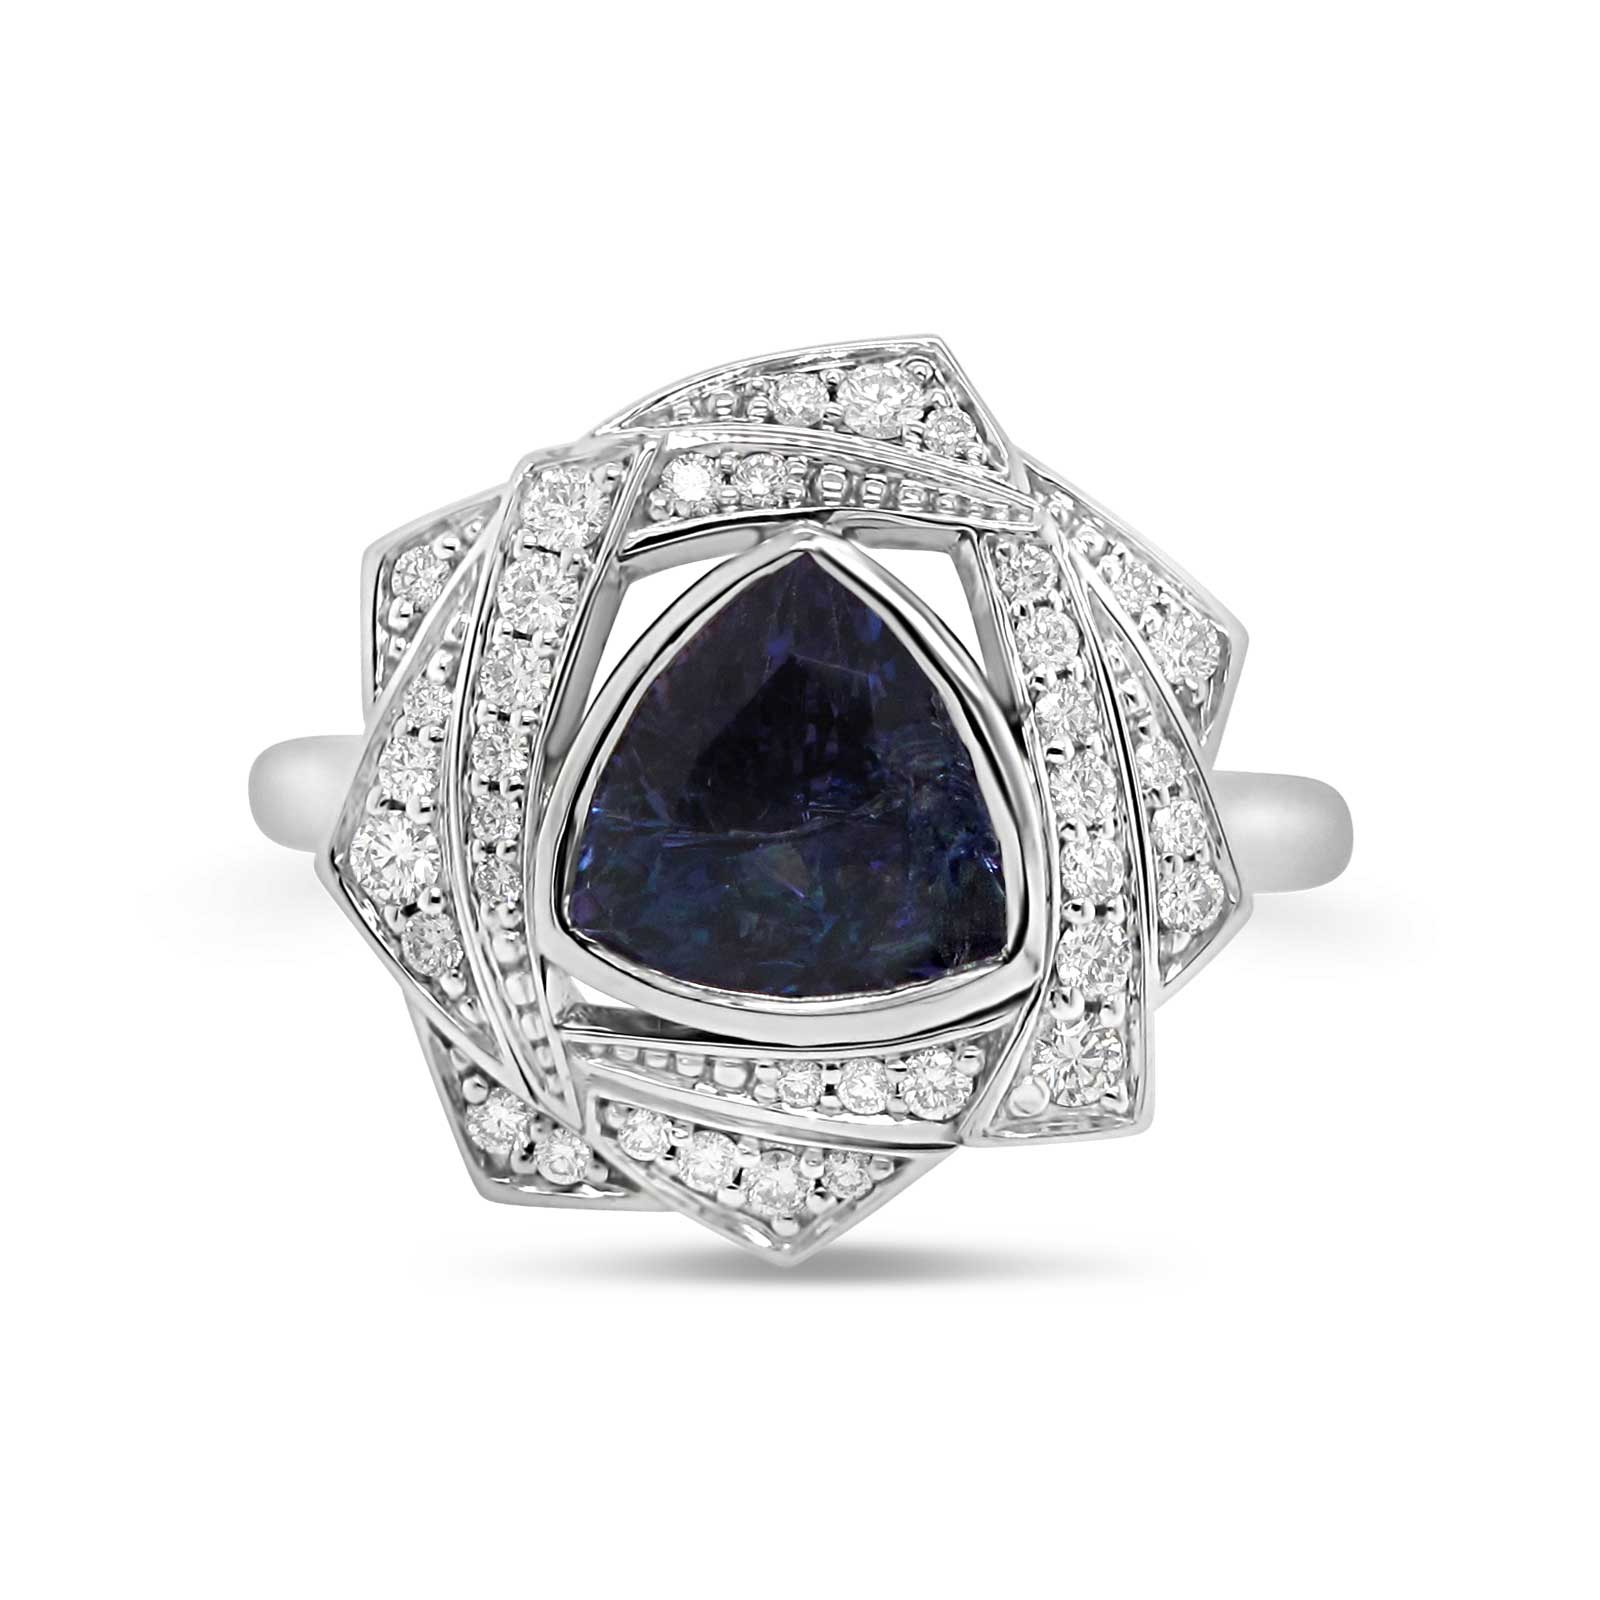 Trillion cut tanzanite with a fancy diamond halo set in 14k white gold